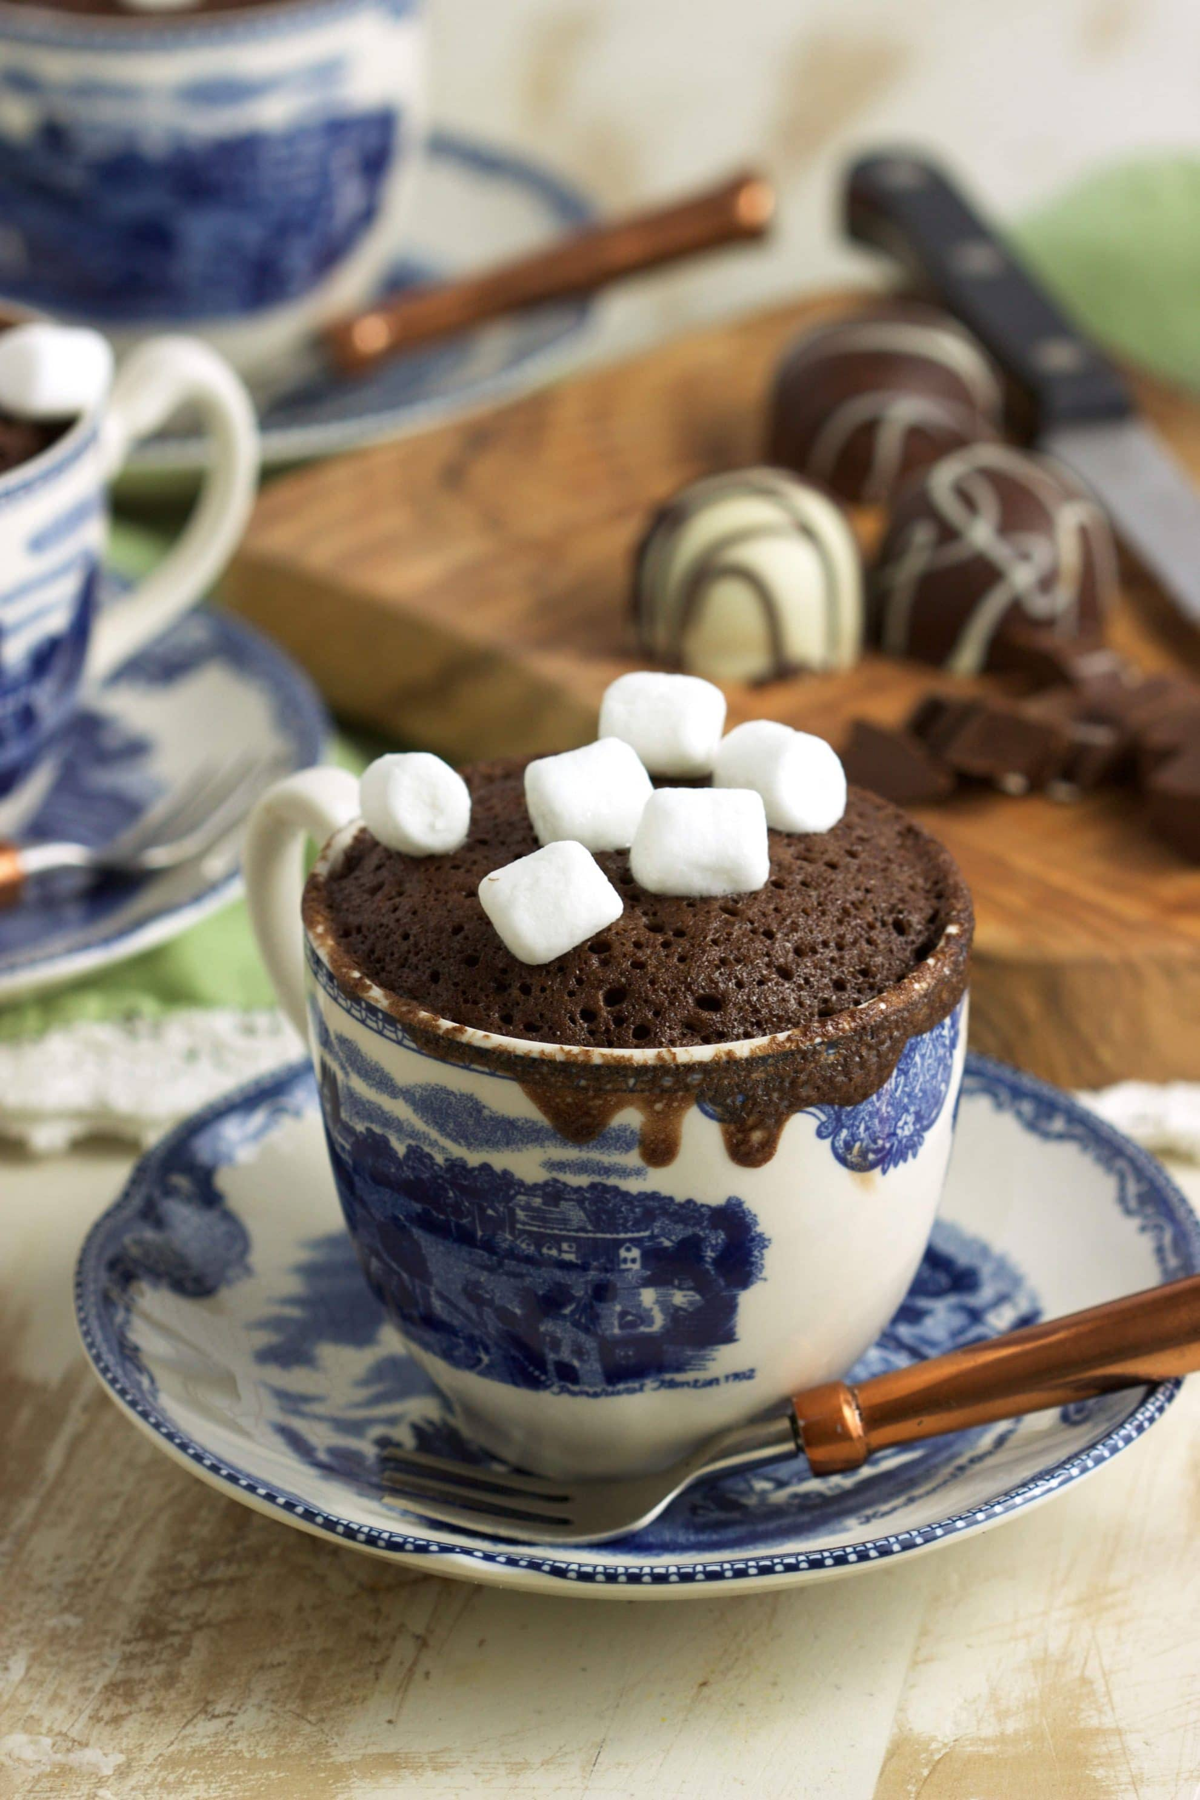 How to Make a Hot Chocolate Mug Cake - The Suburban Soapbox